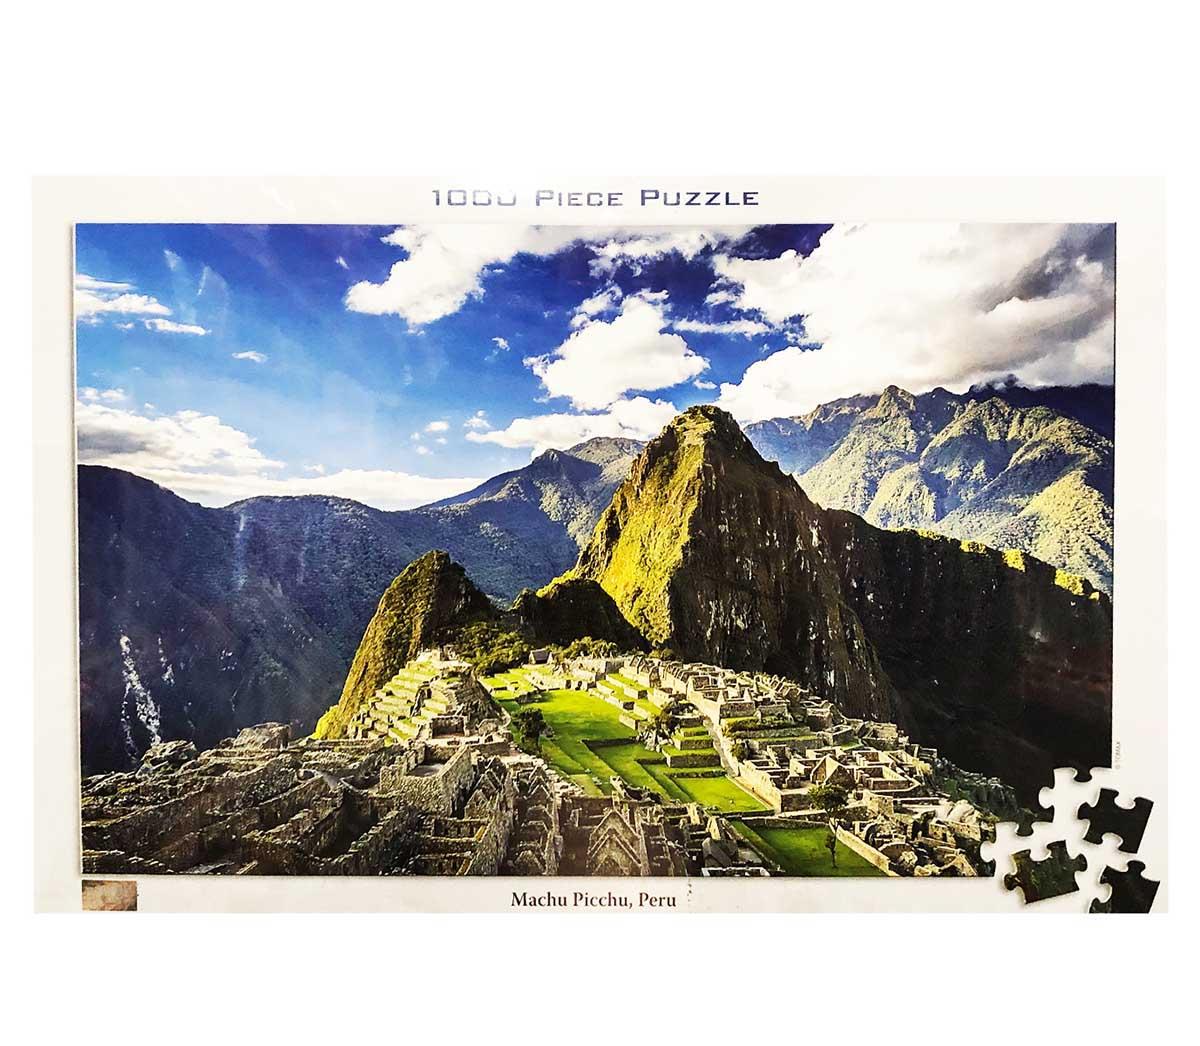 Machu Picchu, Peru Landmarks / Monuments Jigsaw Puzzle